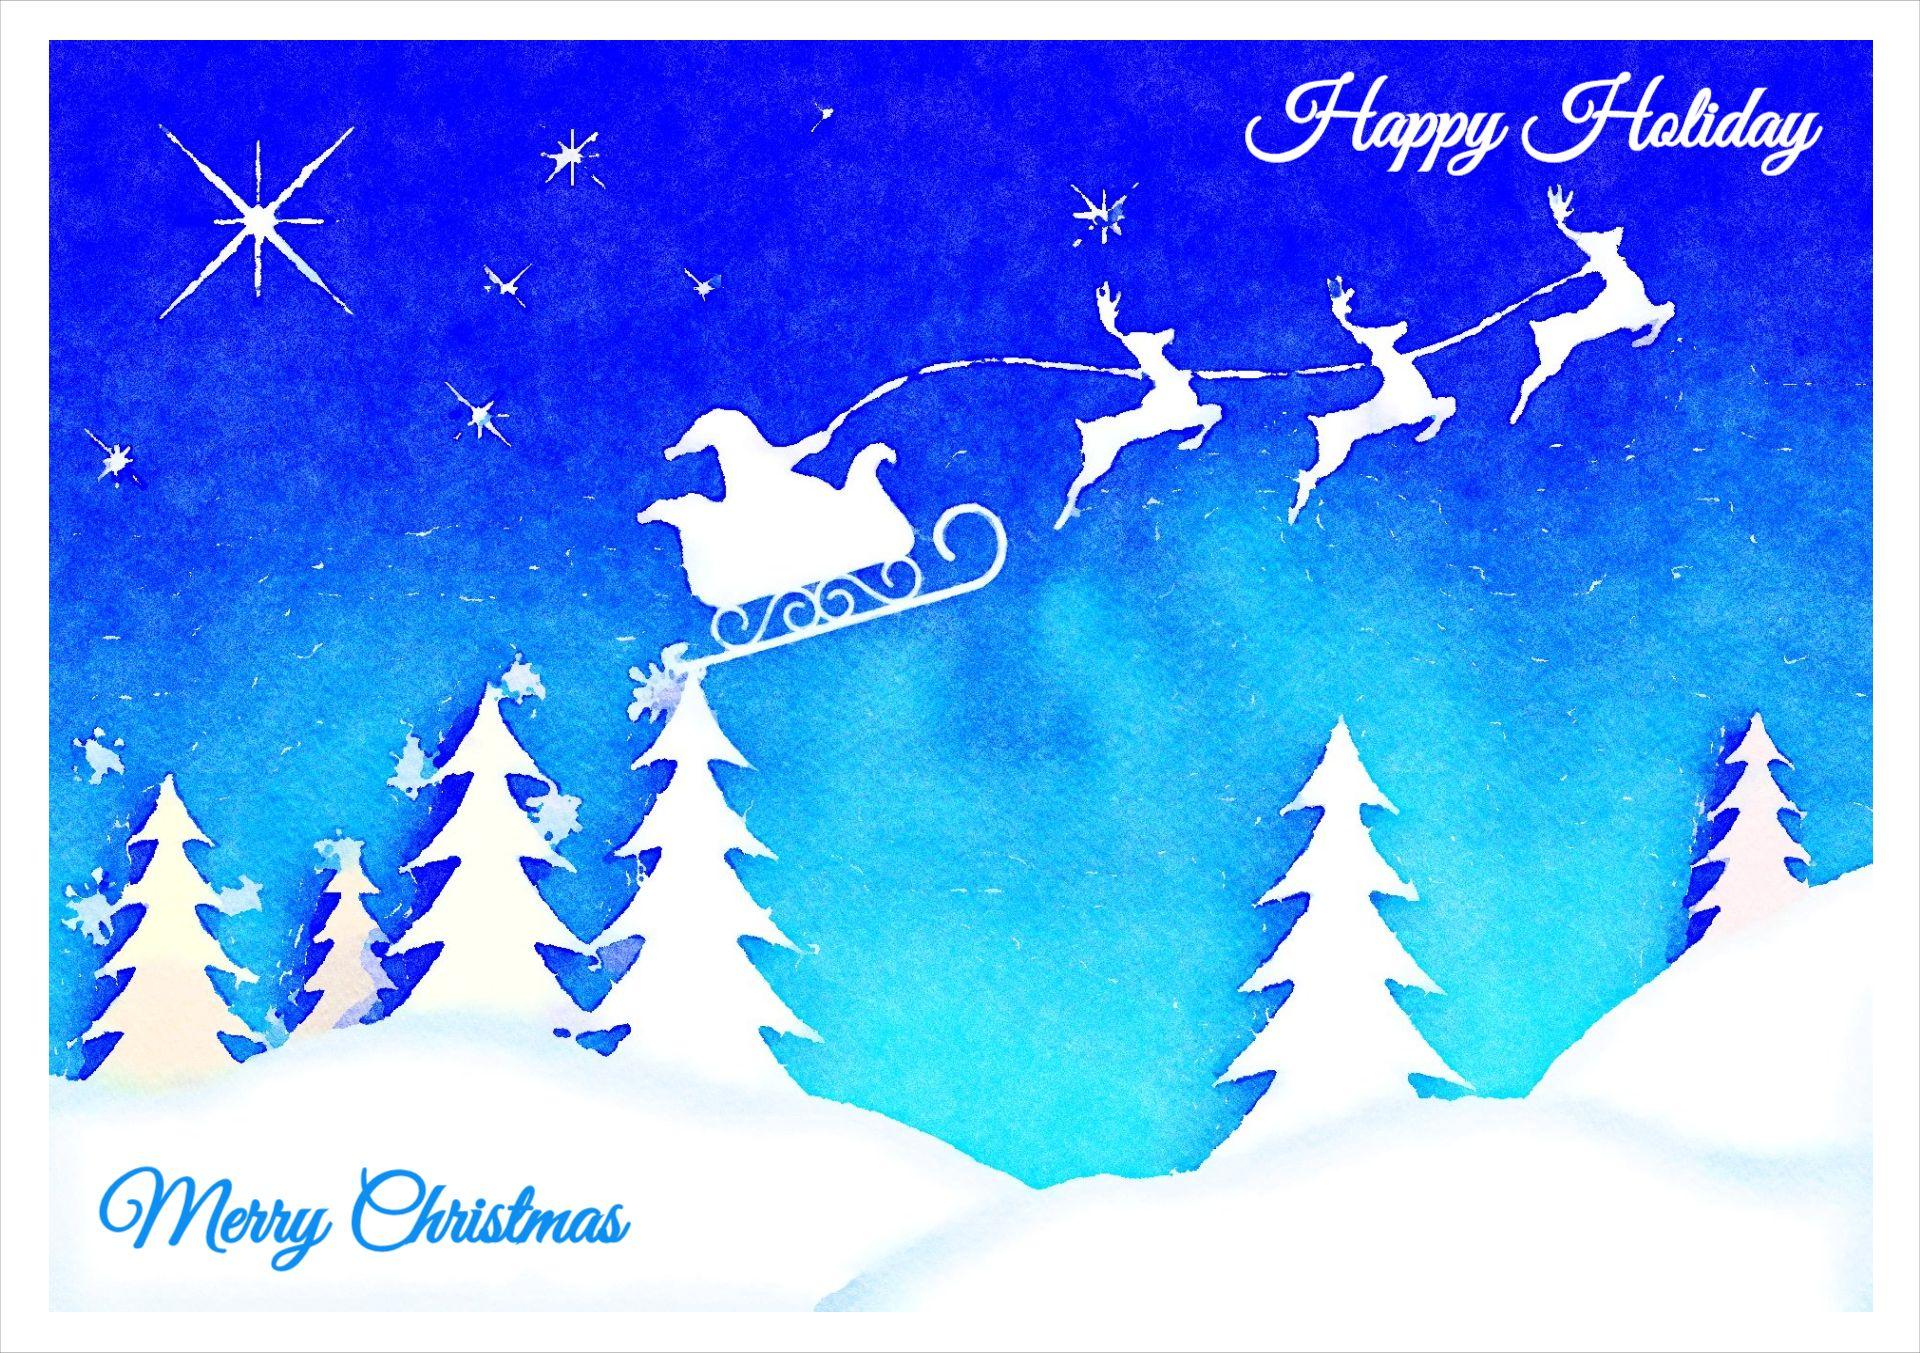 Watercolor Christmas Greetings Card Template